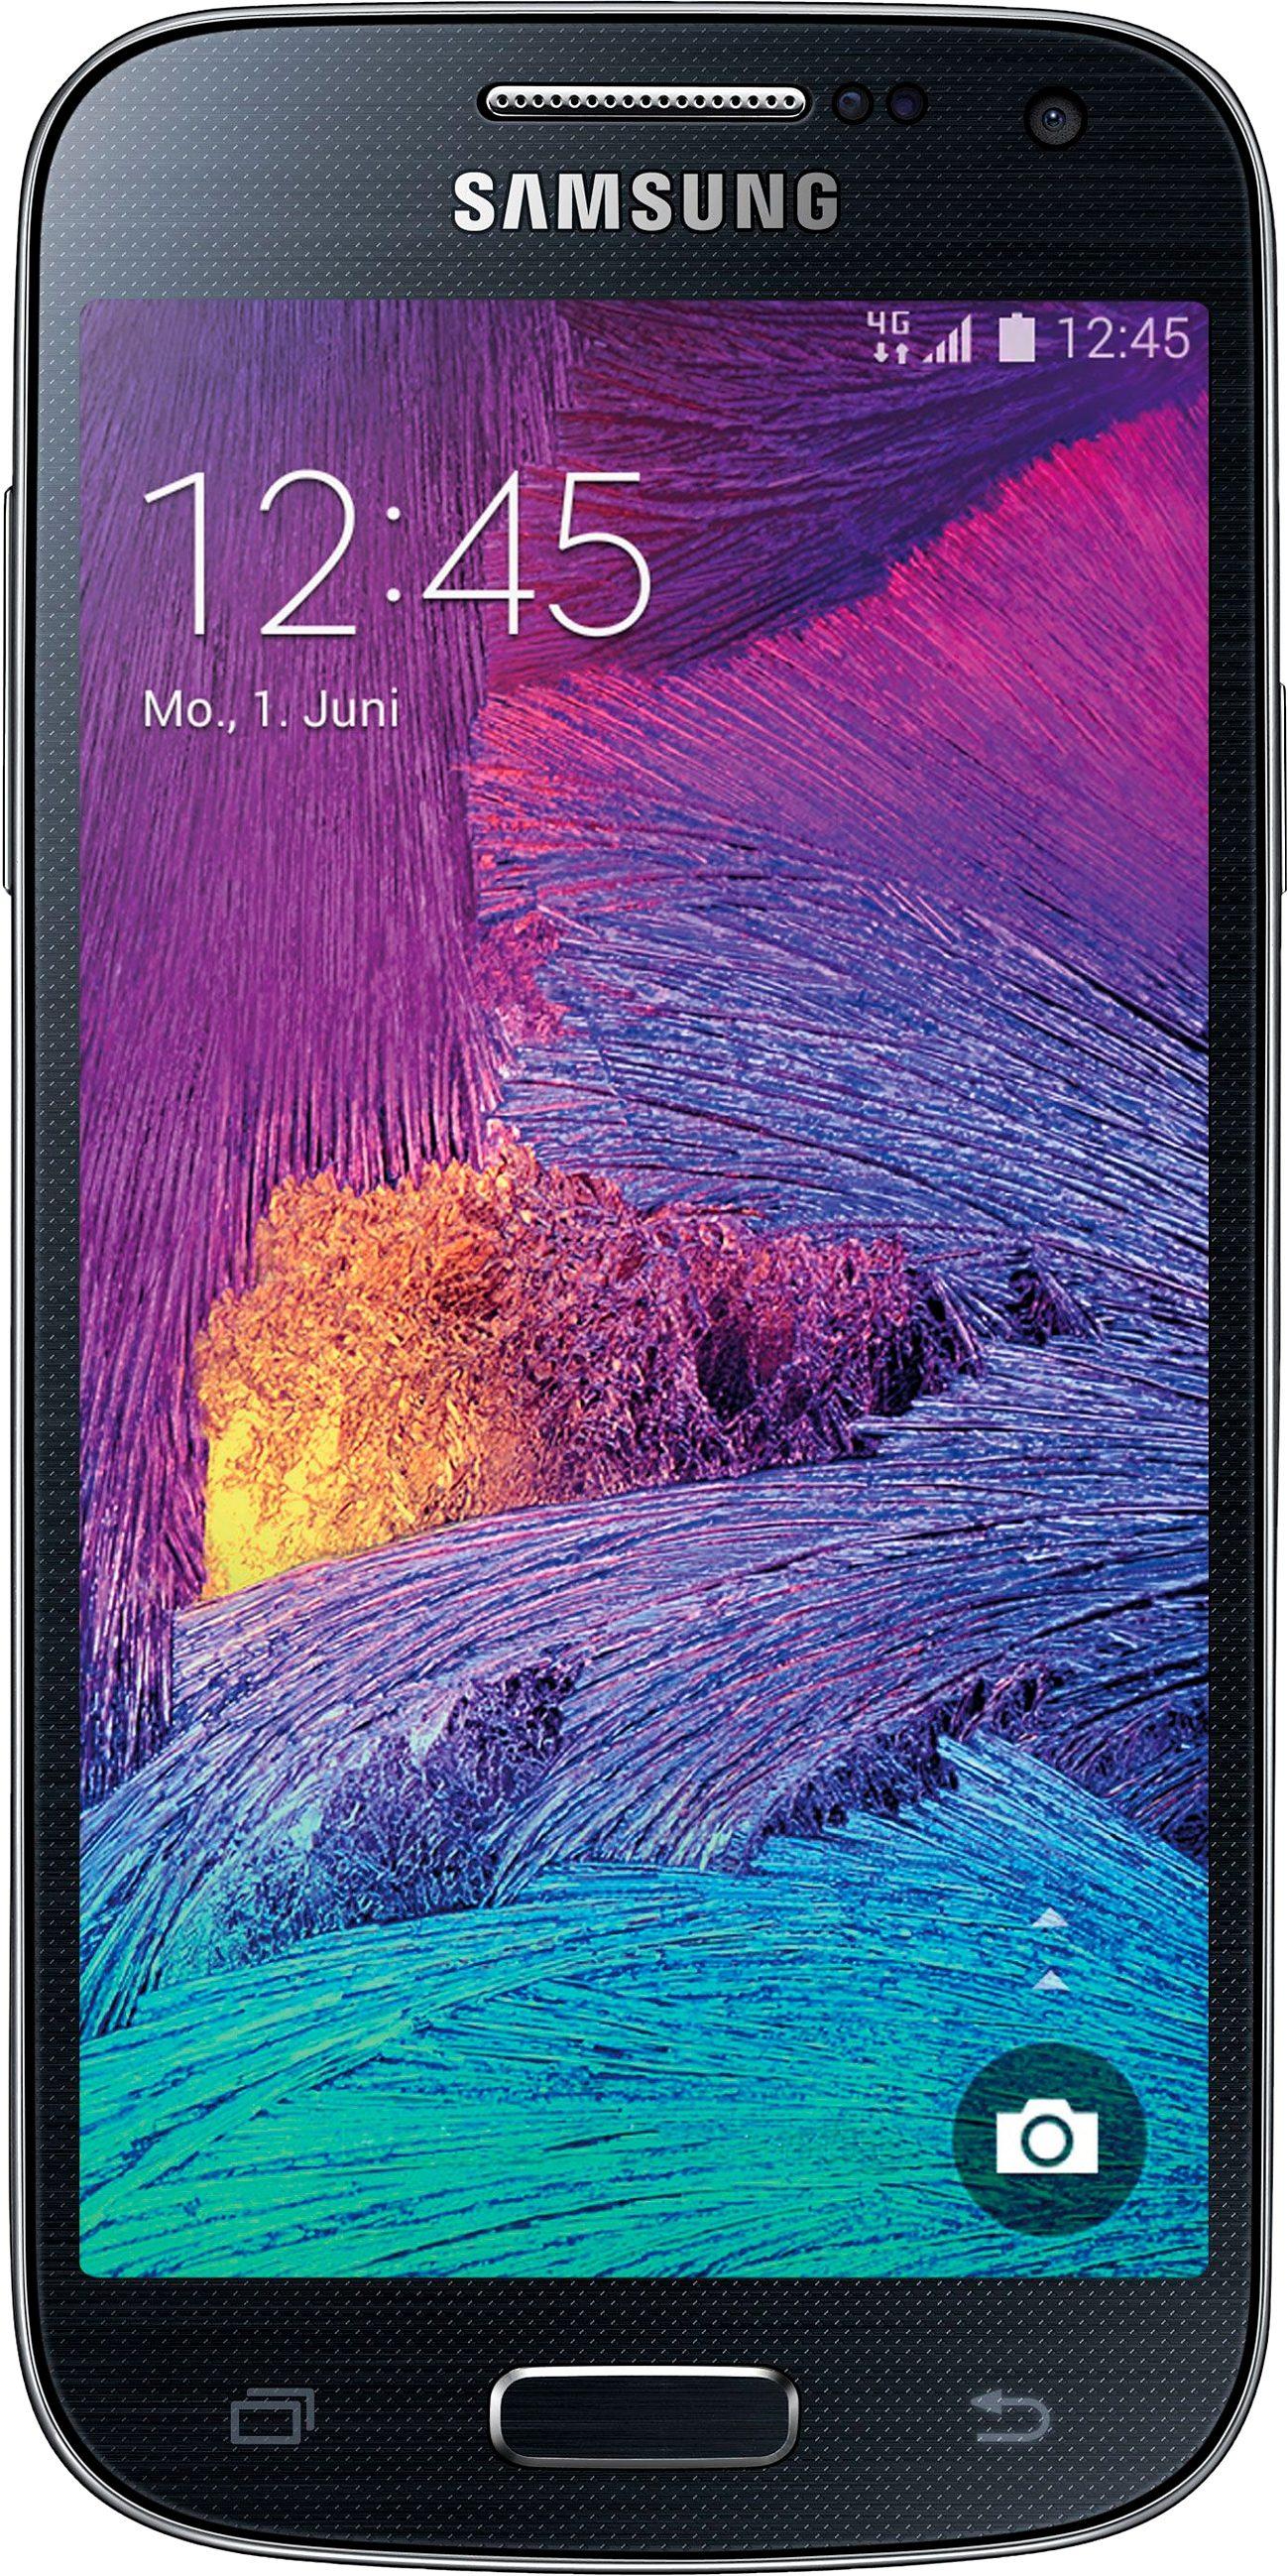 Samsung Galaxy S4 mini - I9195l Smartphone, Android, 8,0 Megapixel, 10,9 cm (4,3 Zoll) Display